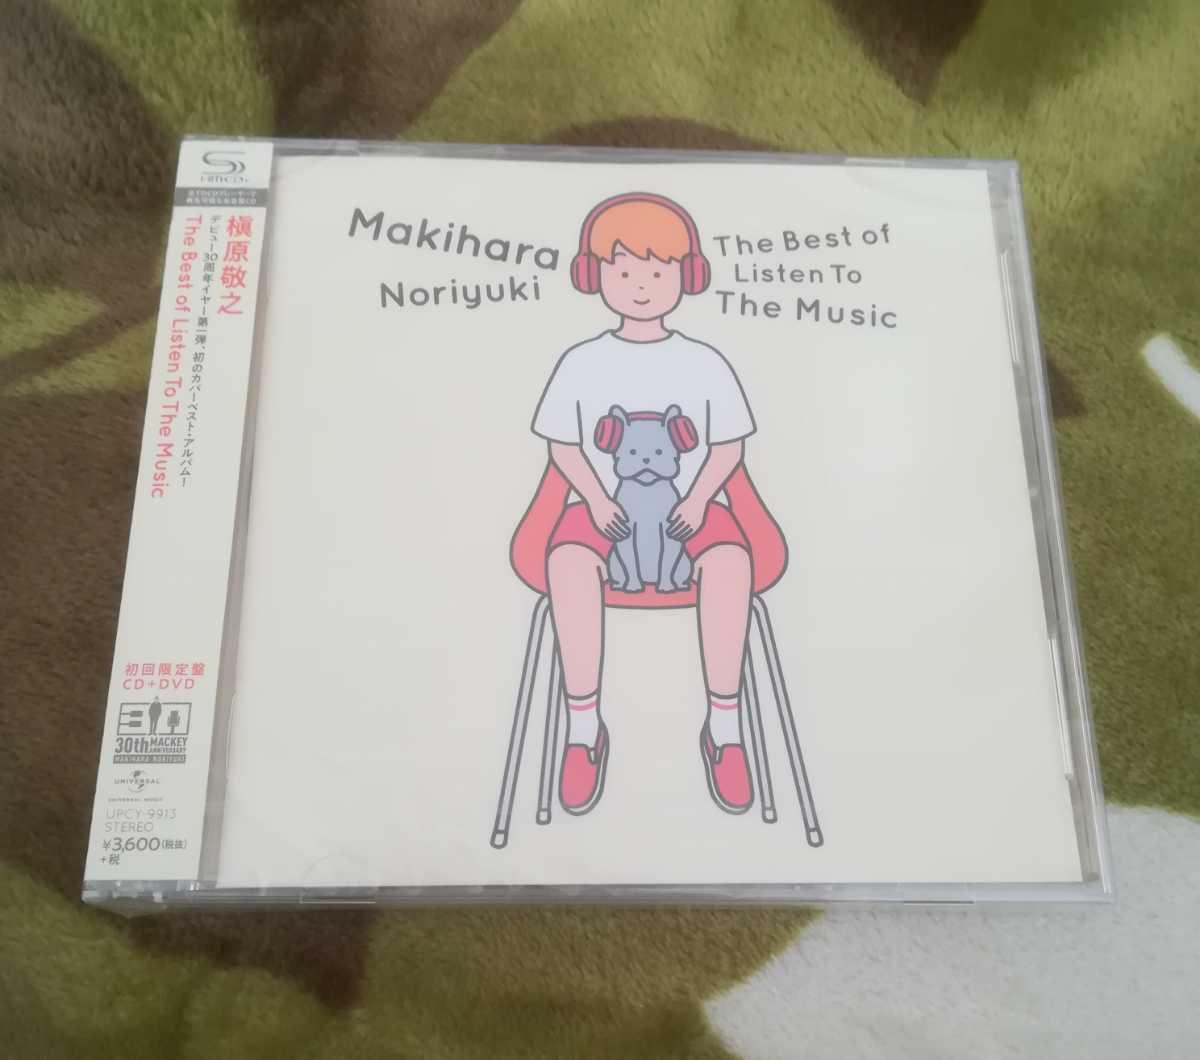 The Best of Listen To The Music 初回限定盤 (DVD付)(SHM-CD) 新品 未開封 槇原敬之_画像1